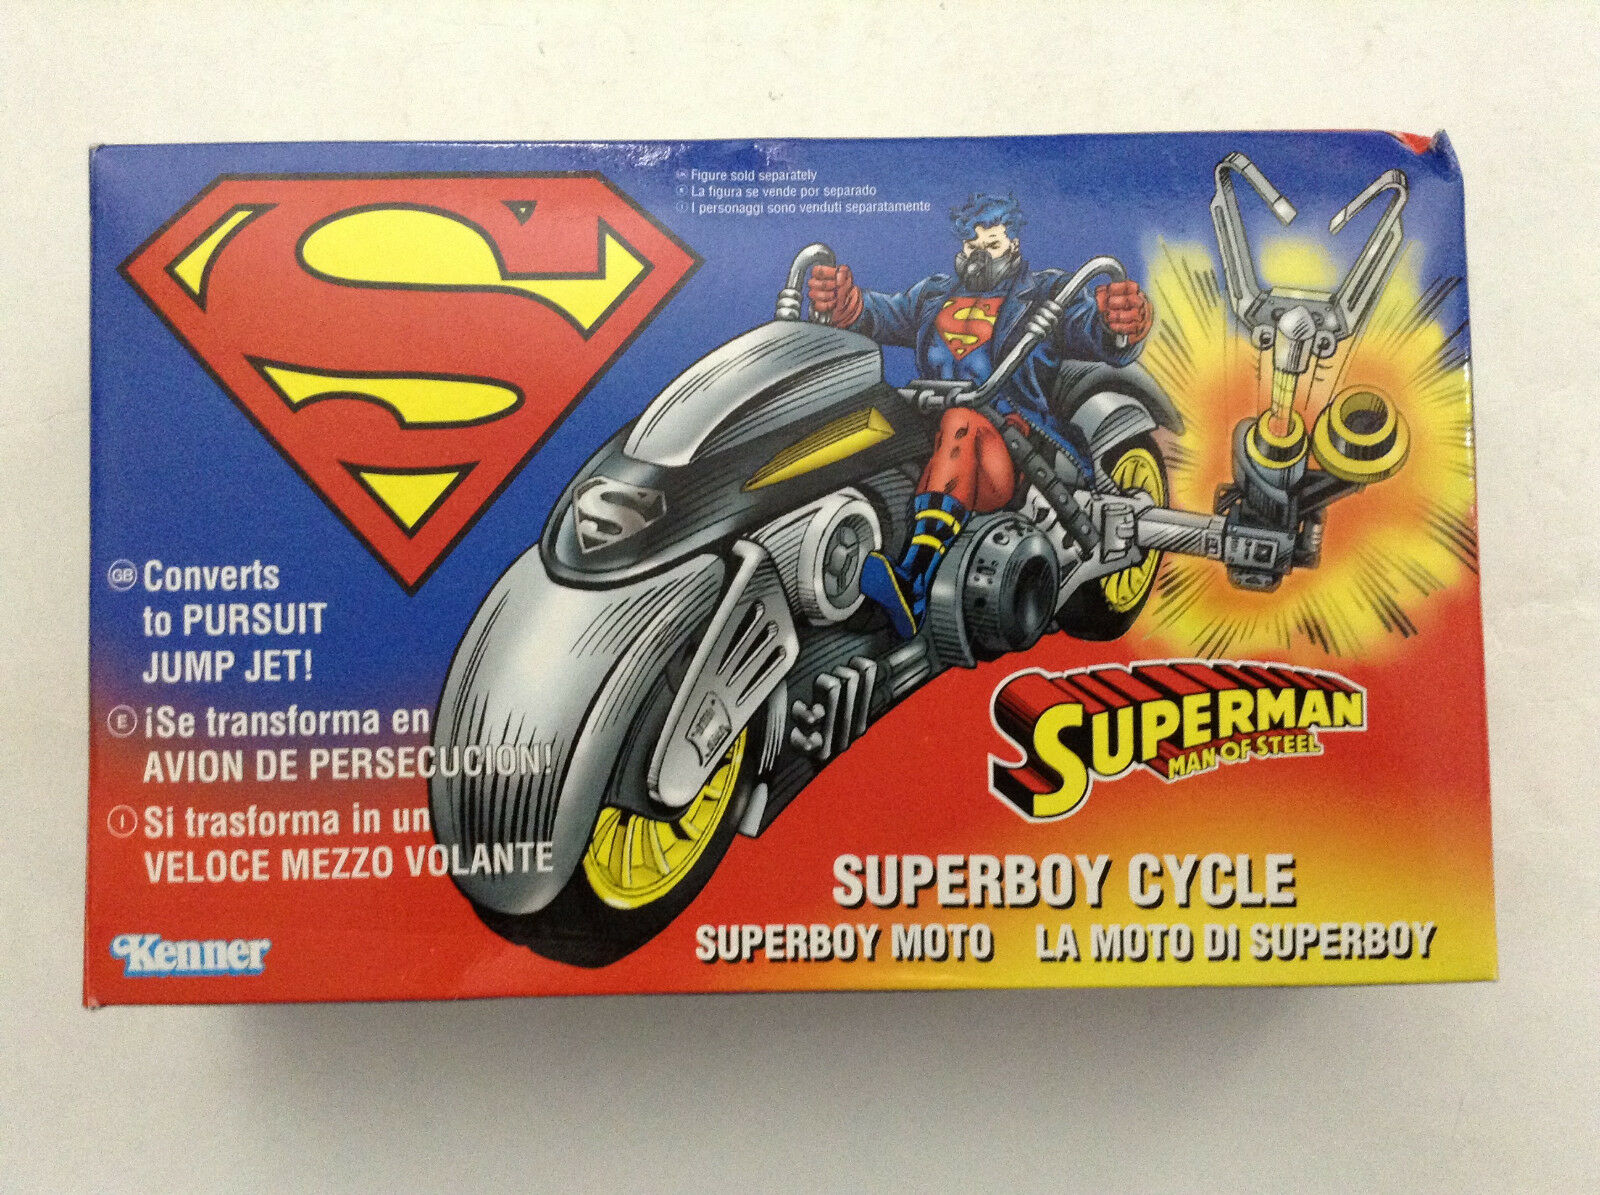 SUPERMAN MAN OF STEEL SUPERBOY CYCLE NEW(REBIRTH 52 TEEN TEEN TEEN TITANS JUSTICE LEAGUE 1 25ea6c